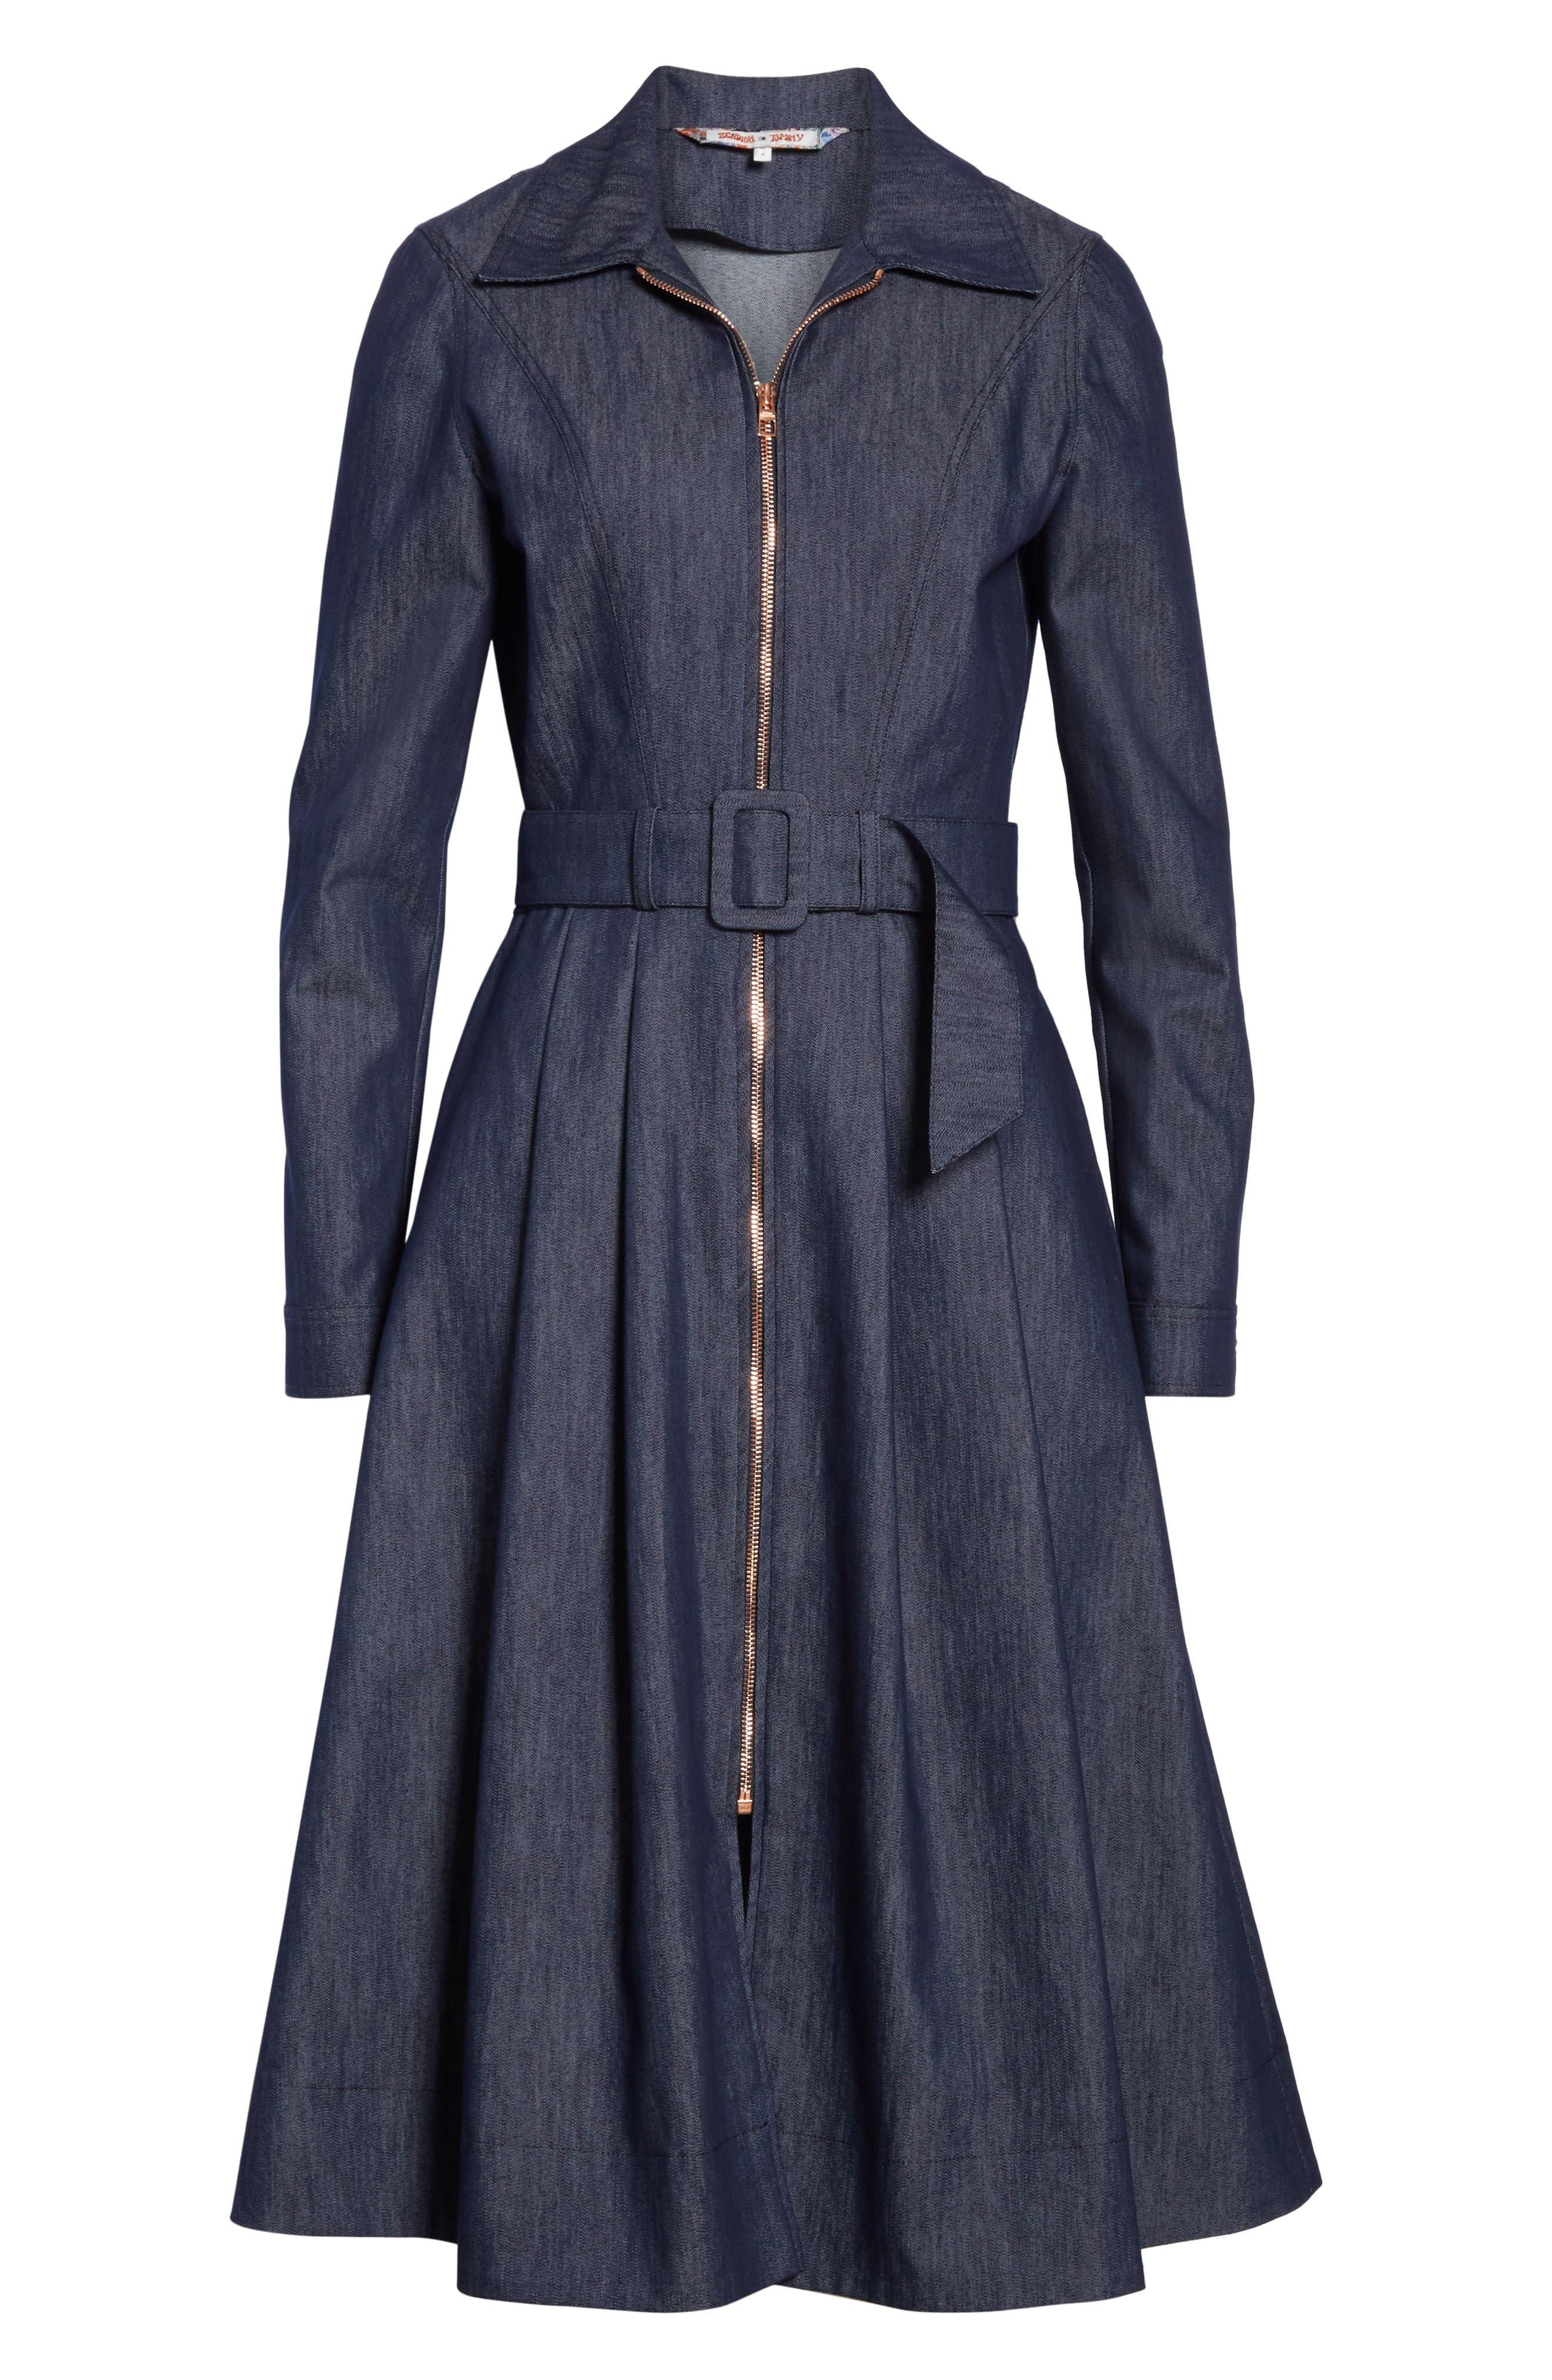 TOMMY X ZENDAYA, Belted Denim Dress, Alternate thumbnail 6, color, DENIM BLUE